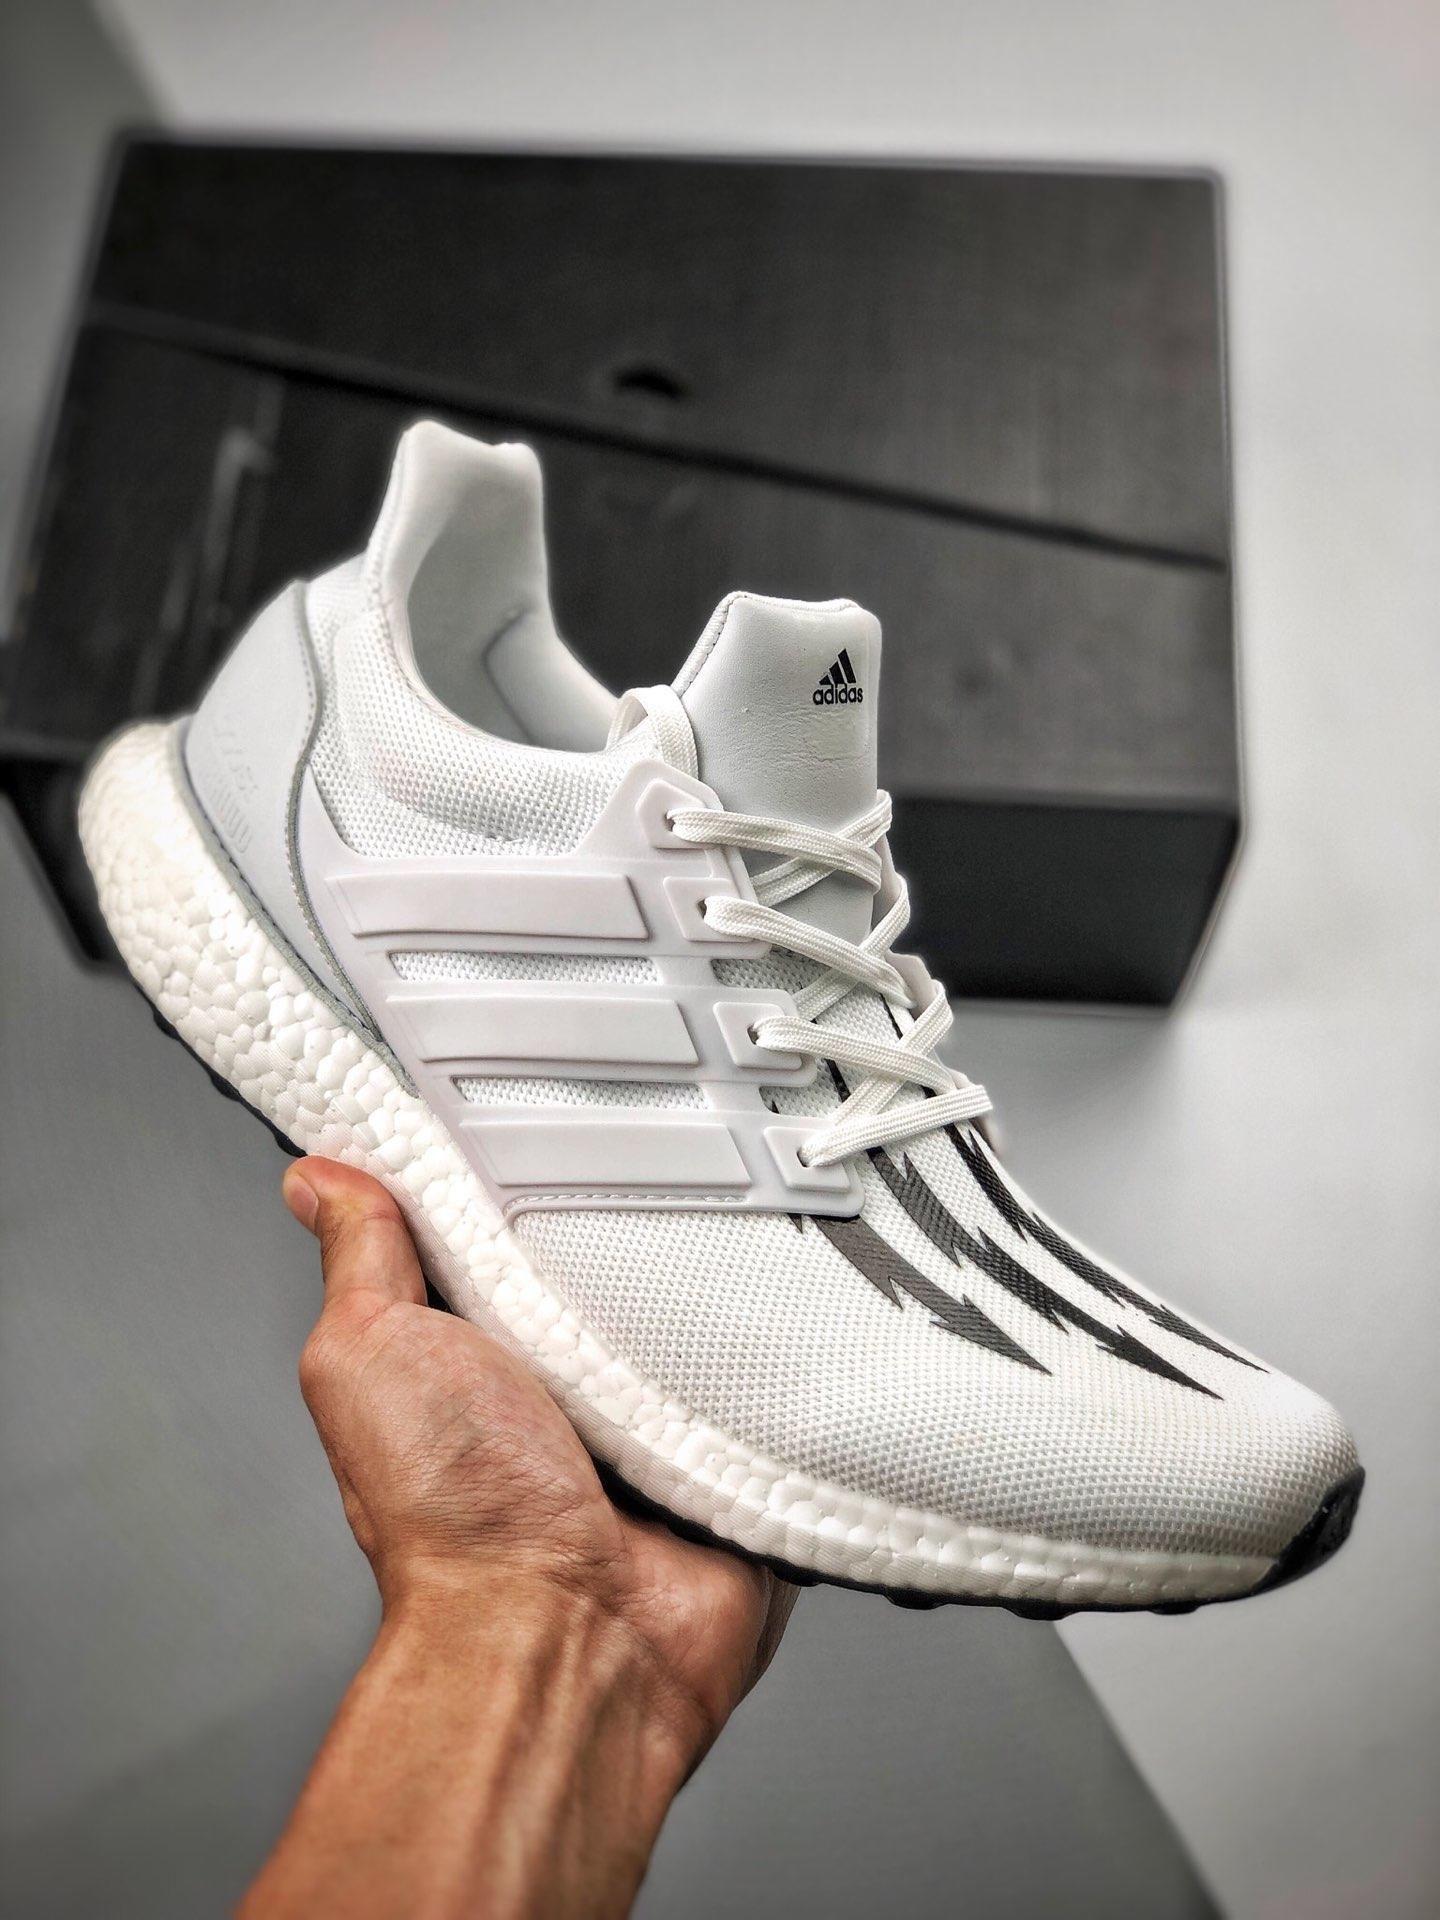 Adidas Ultra Boost X Neighborhood Eg7650